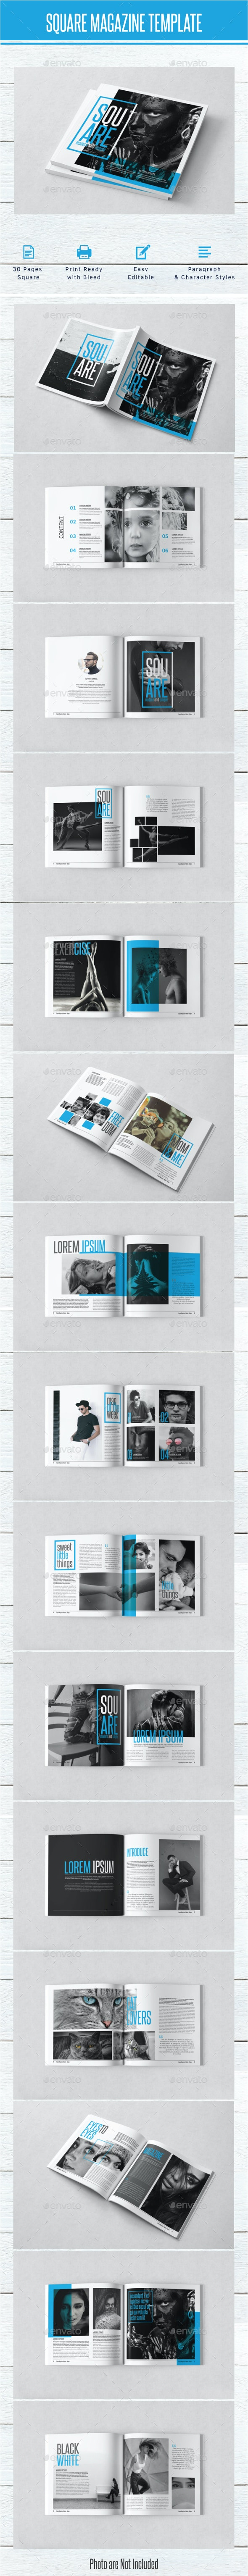 Square Magazine Template - Magazines Print Templates